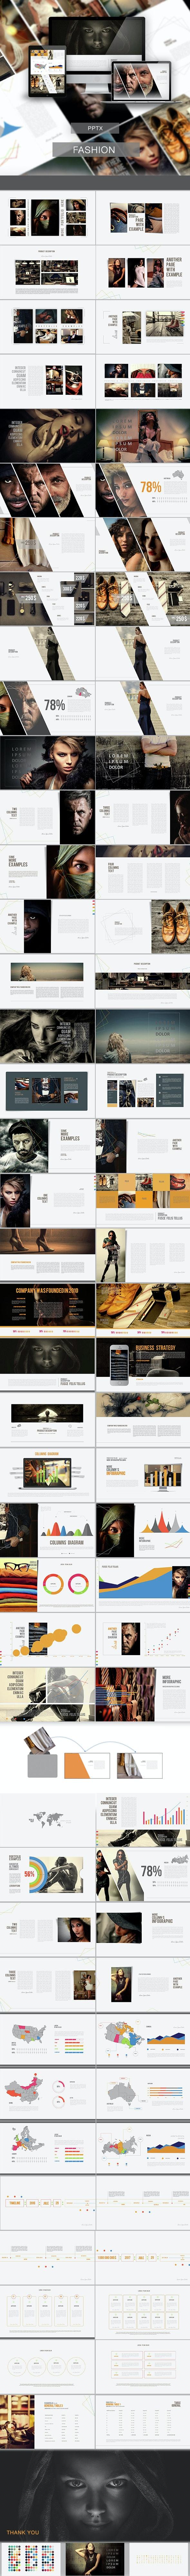 Fashion PowerPoint Presentation - PowerPoint Templates Presentation Templates